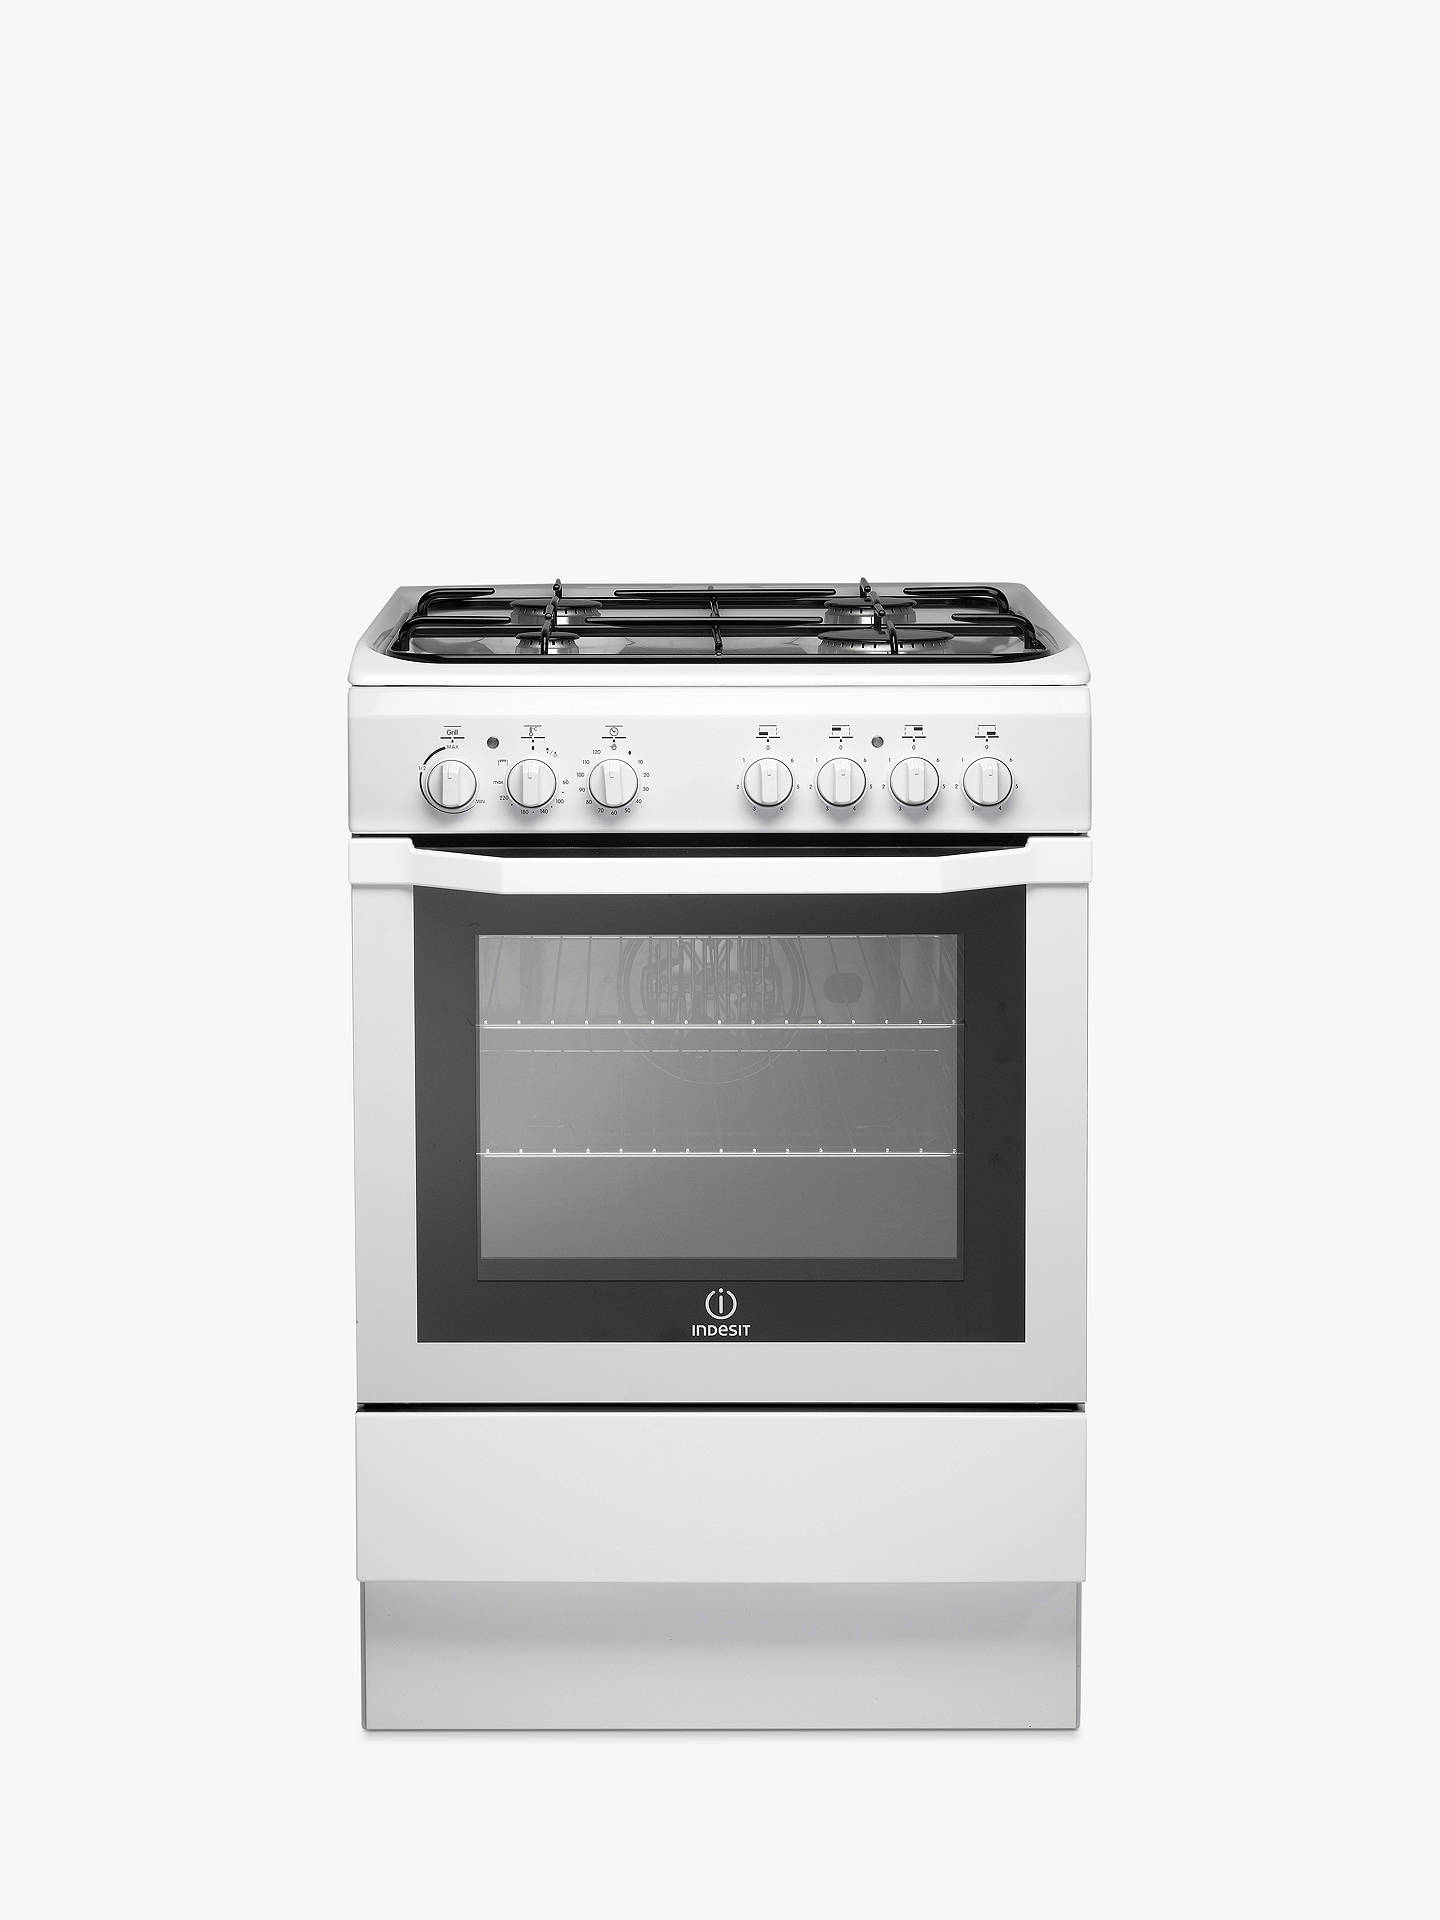 indesit i6gg1w gas cooker white at john lewis partners. Black Bedroom Furniture Sets. Home Design Ideas